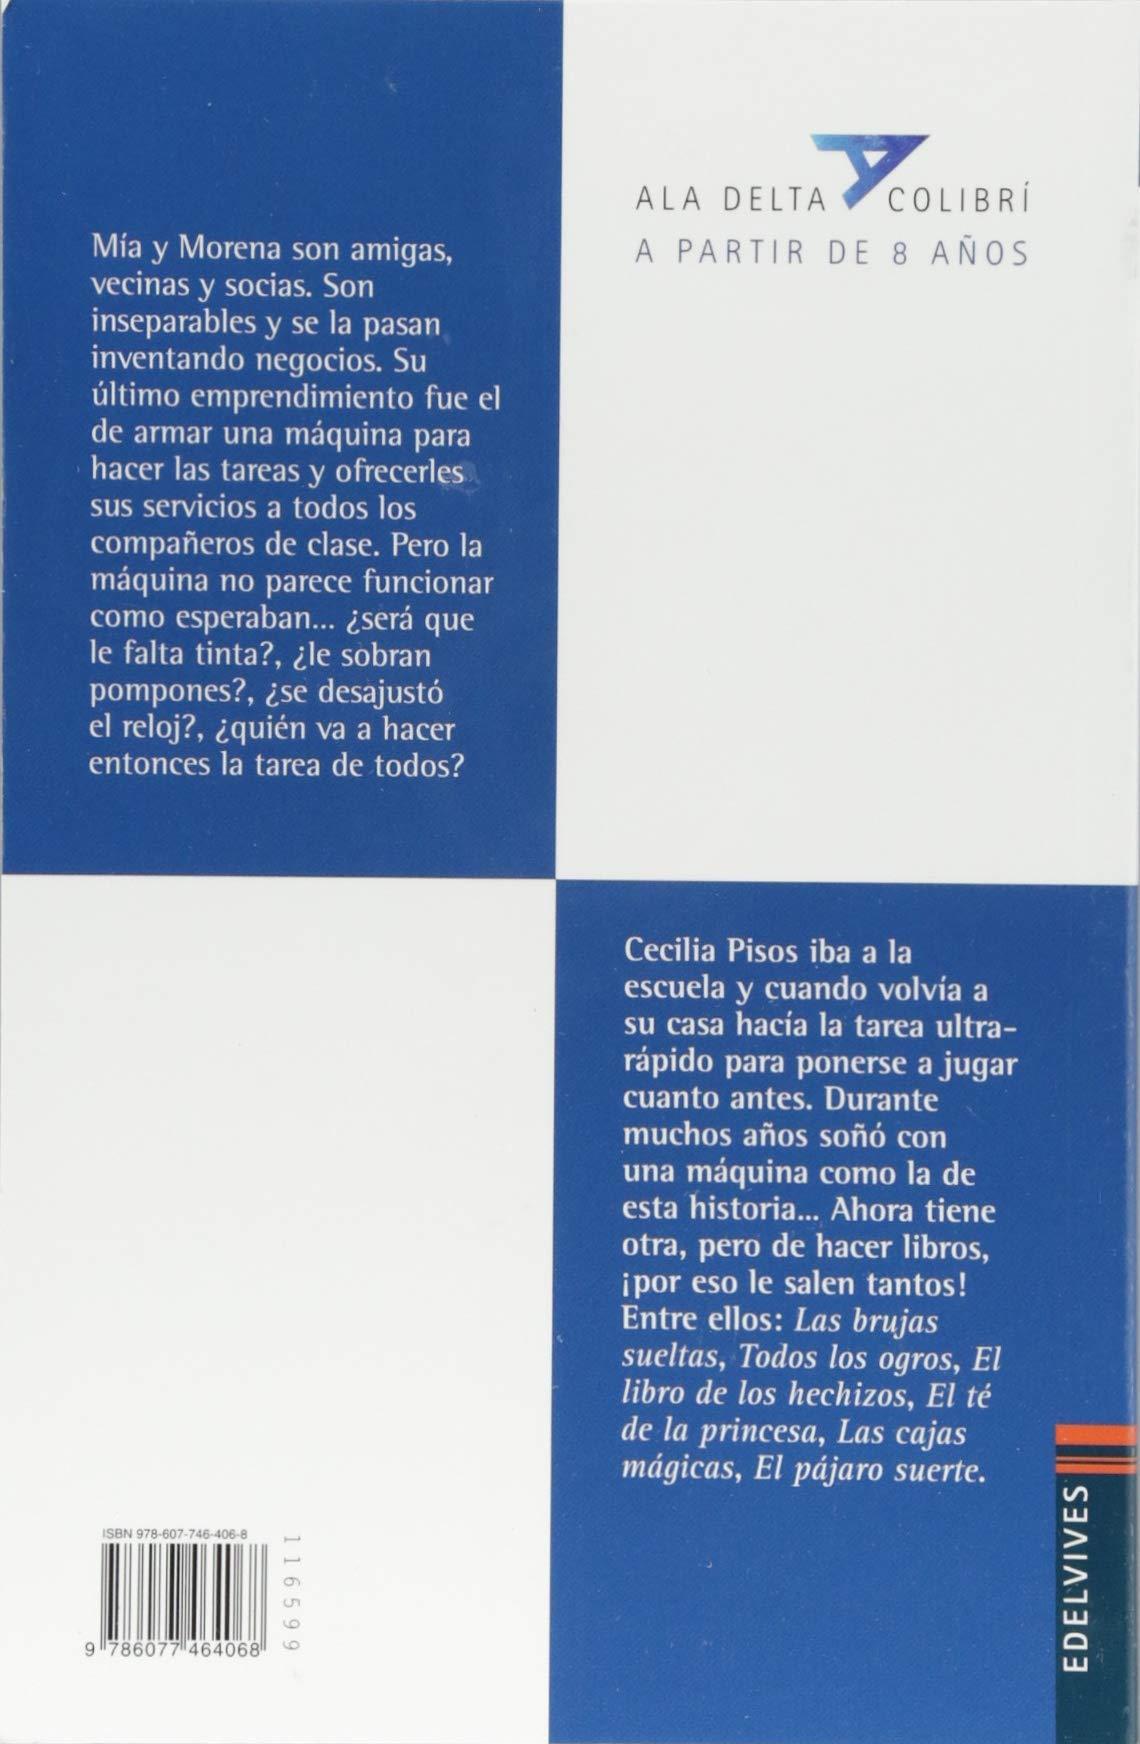 Amazon.com: La Maquina de Hacer Tareas (Spanish Edition) (9786077464068): Cecilia Pisos, Fernando Calvi: Books